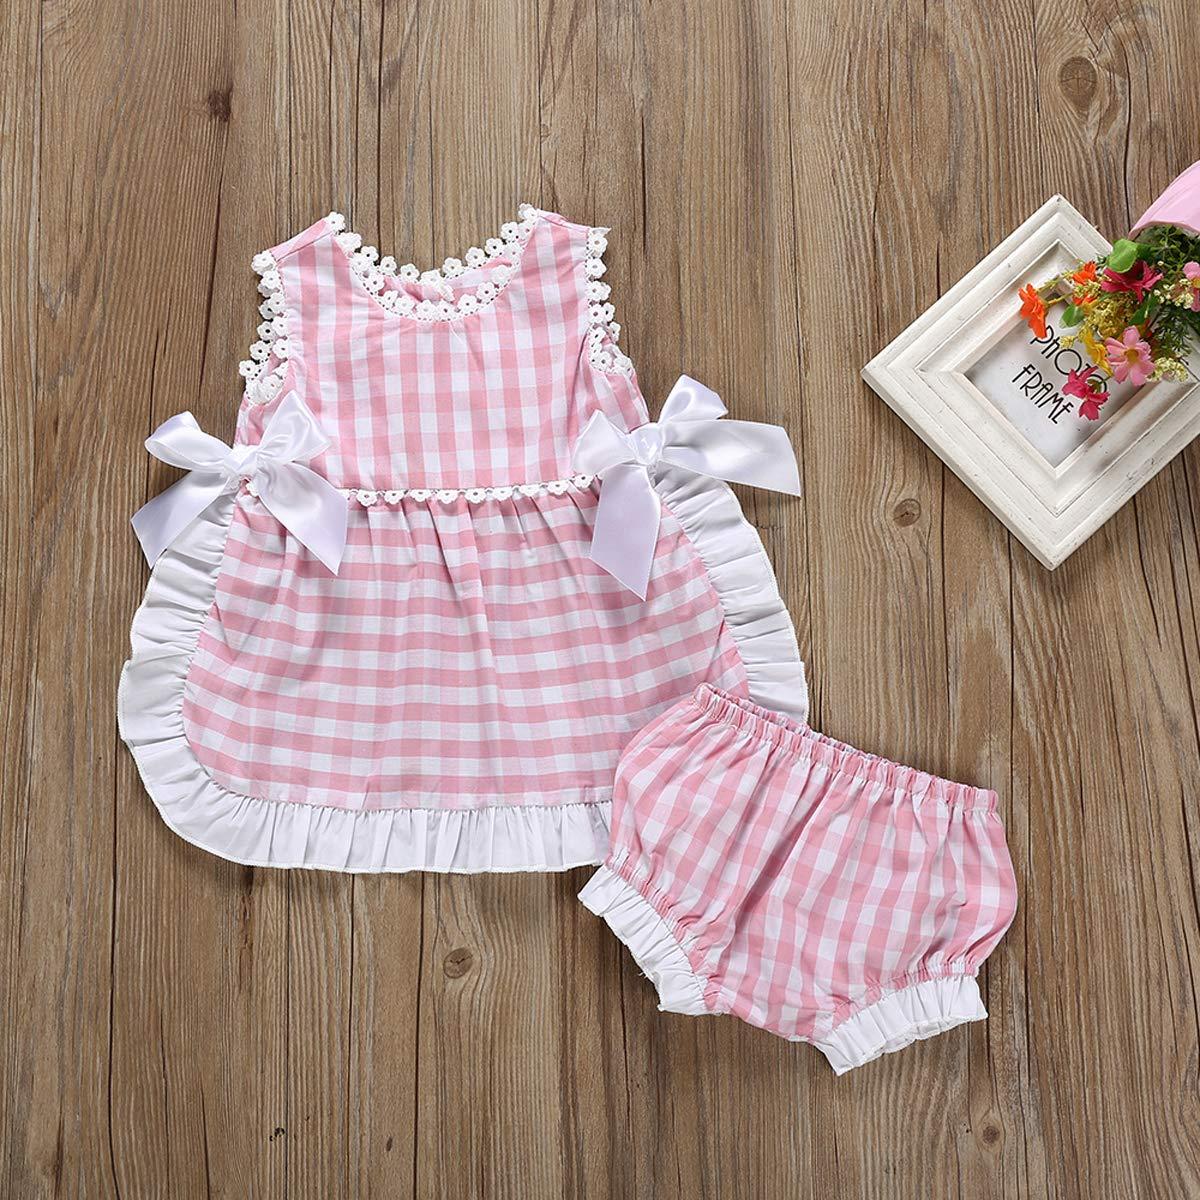 Baby Girl Plaid Sleeveless Backless Bowknot Shirt Dress Ruffle Shorts Clothes Set